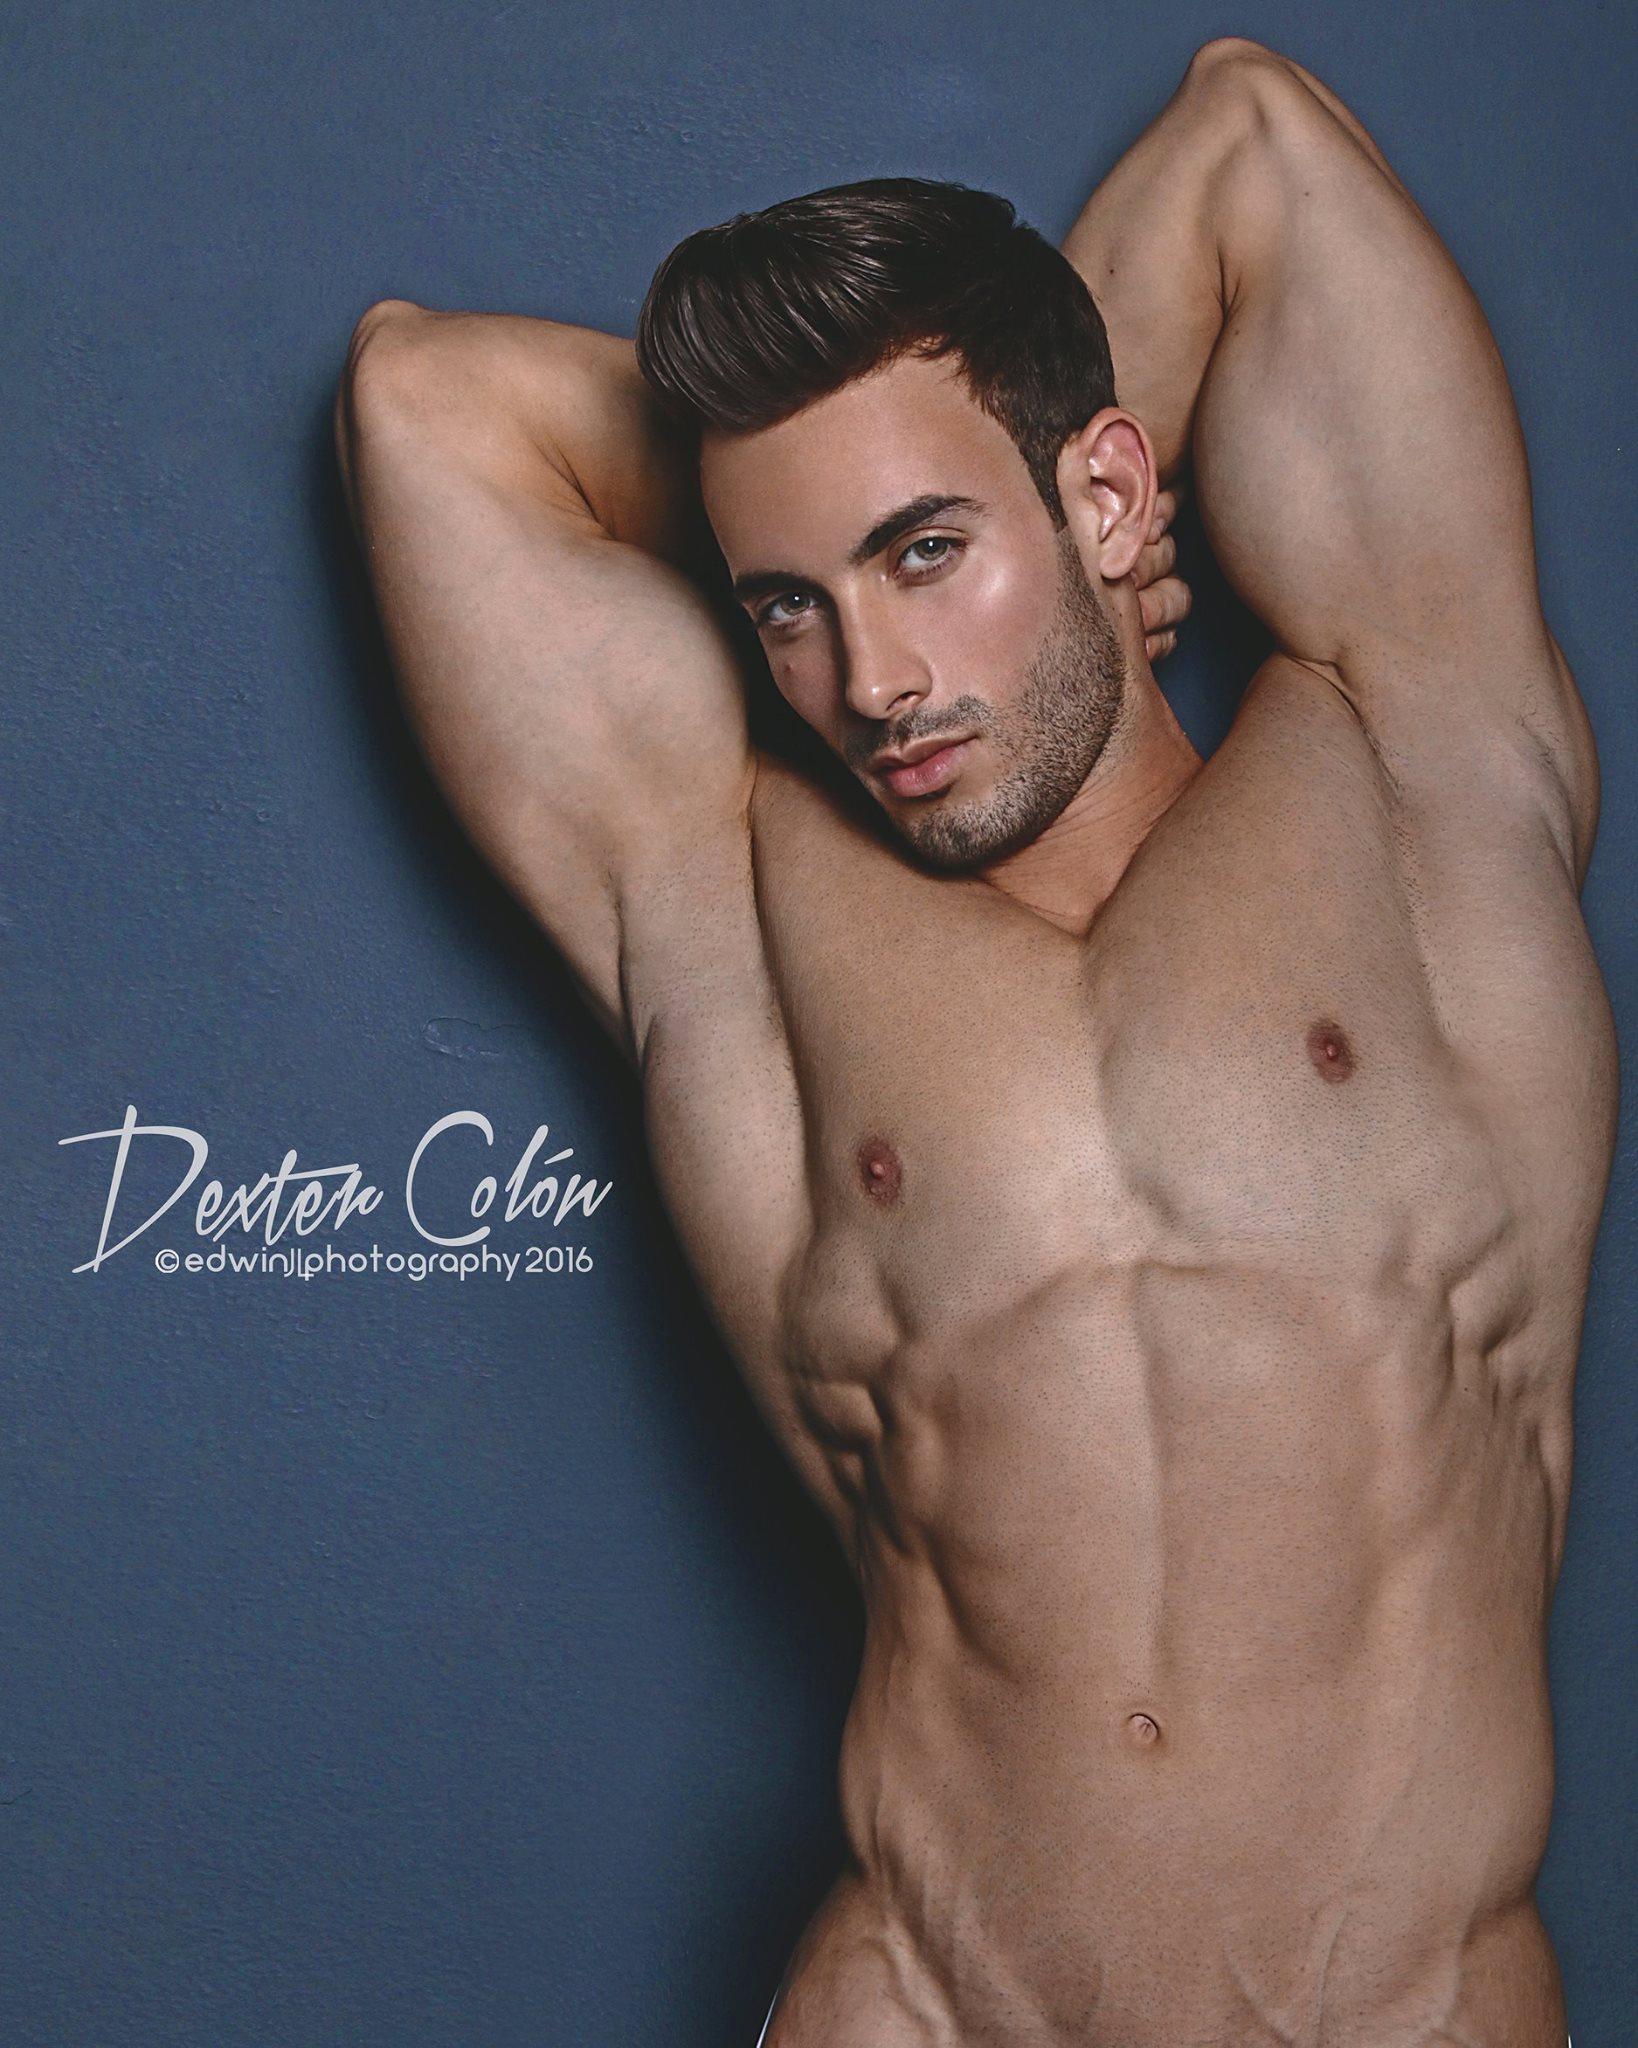 Dexter Colón by Edwin Lebron